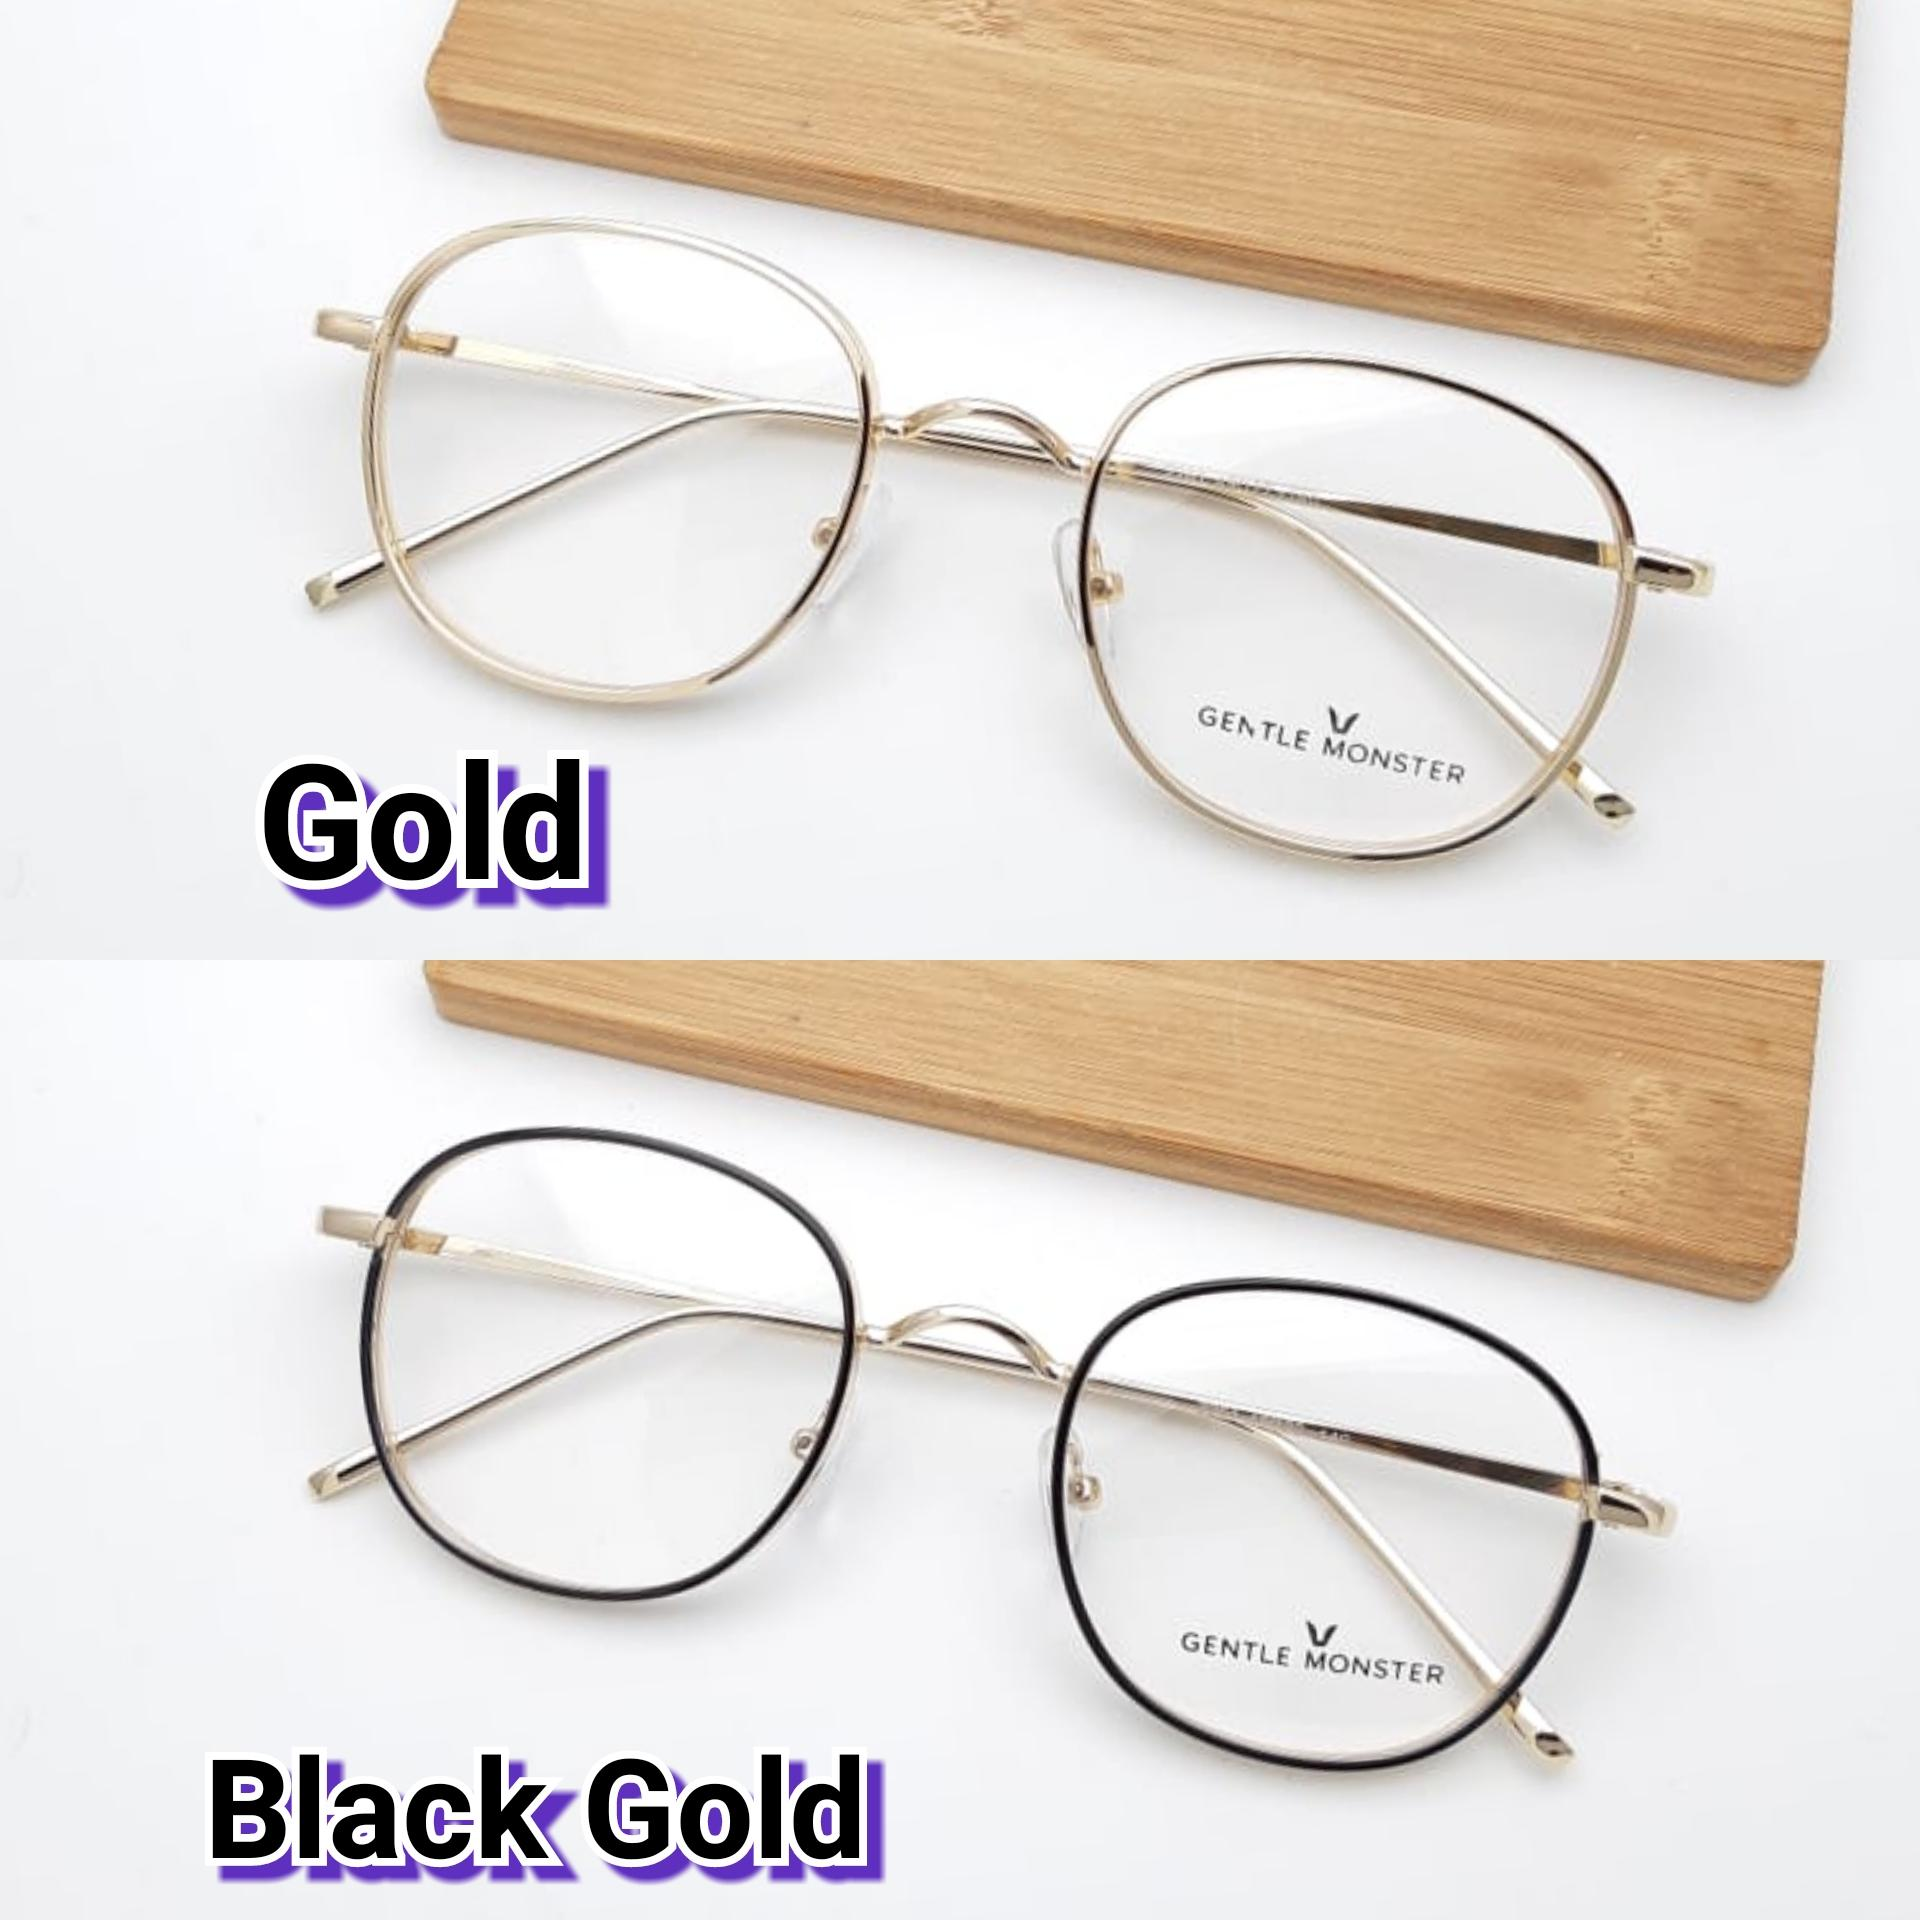 Detail Gambar Frame Kacamata minus Paulin GM Kacamata baca kacamata bulat kacamata  minus   plus   c128a36f87